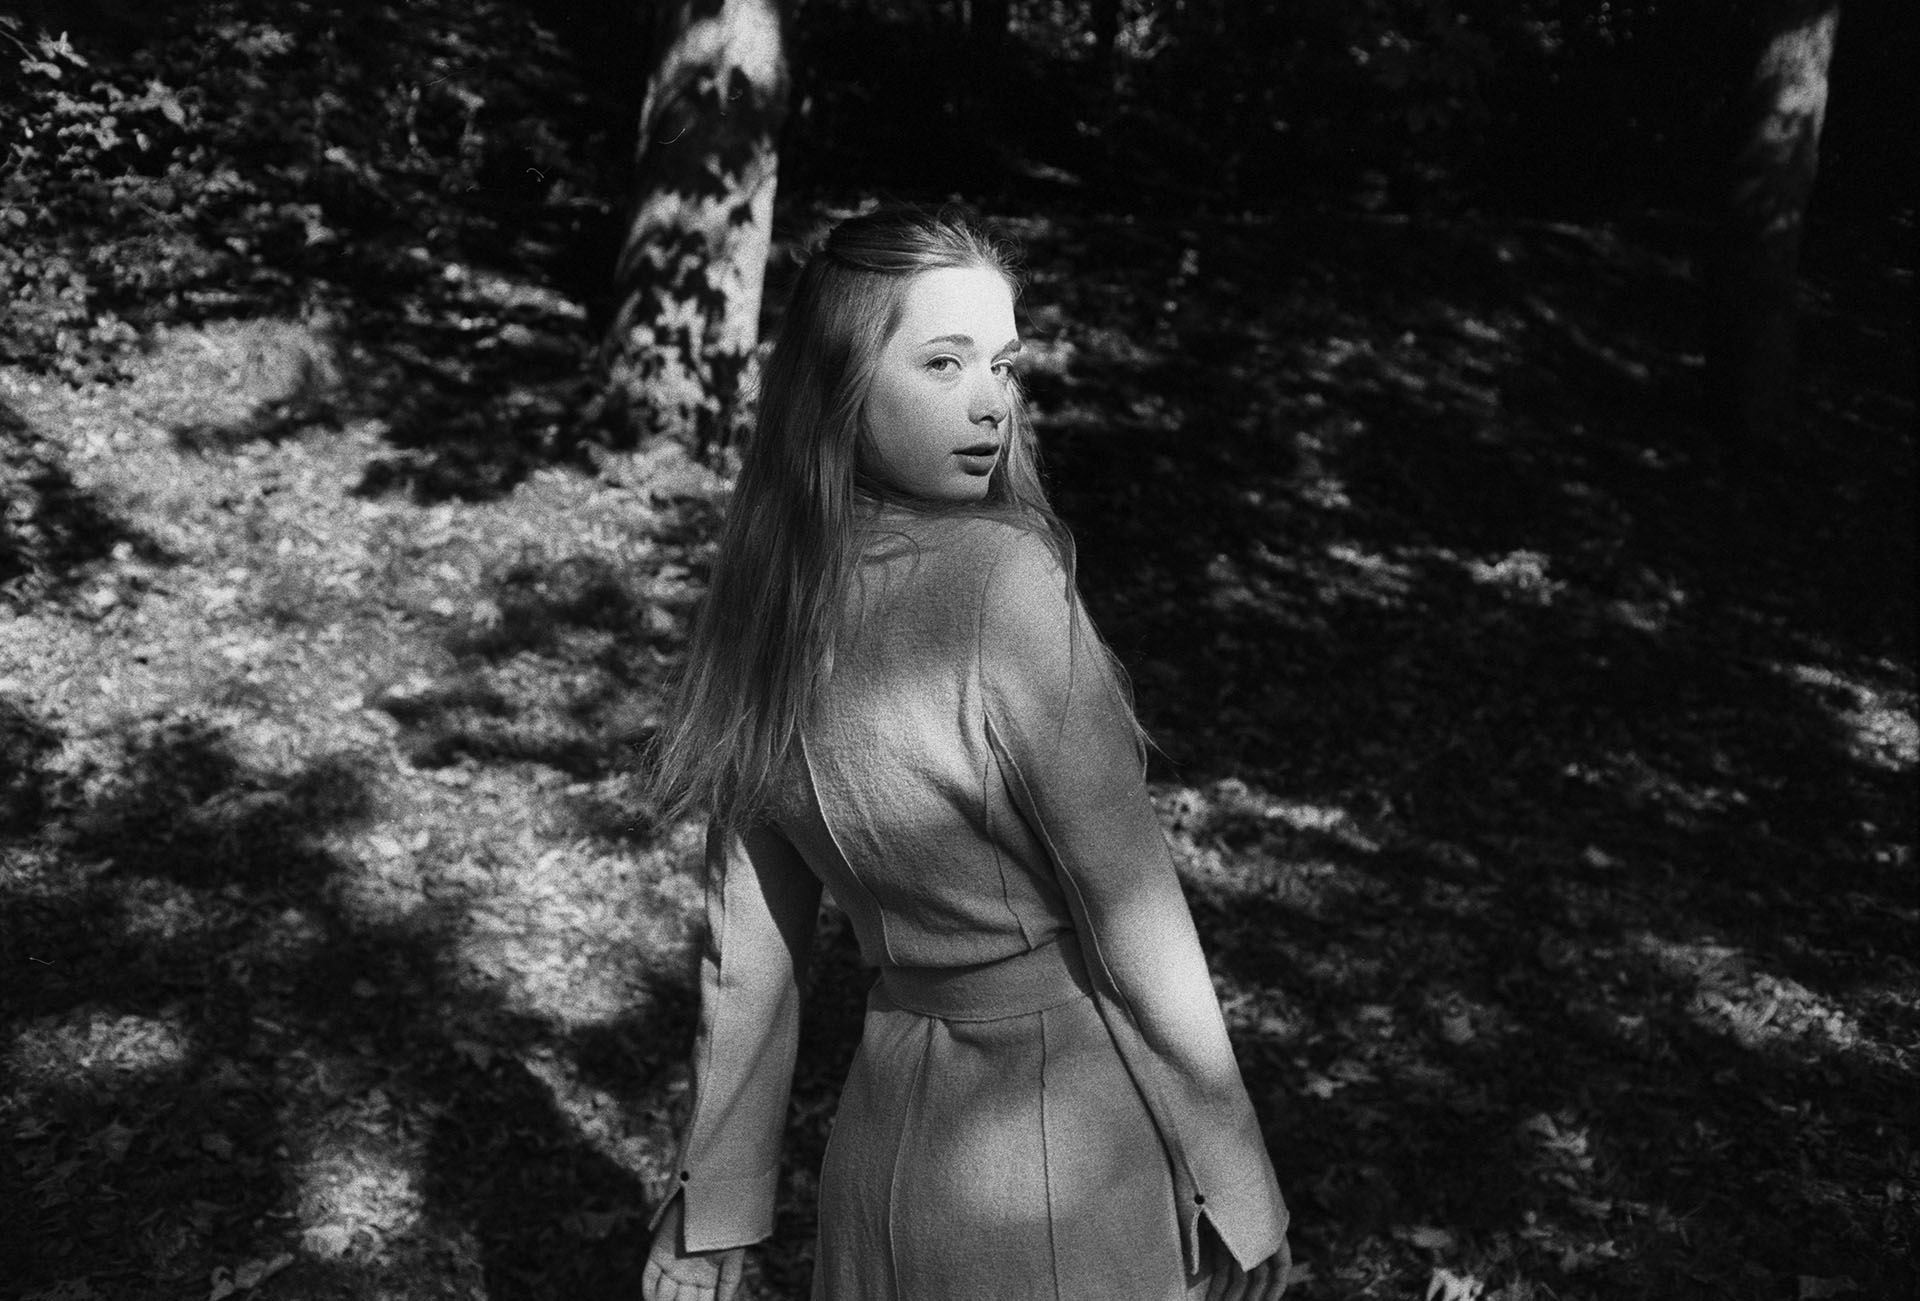 35mm black and white portrait